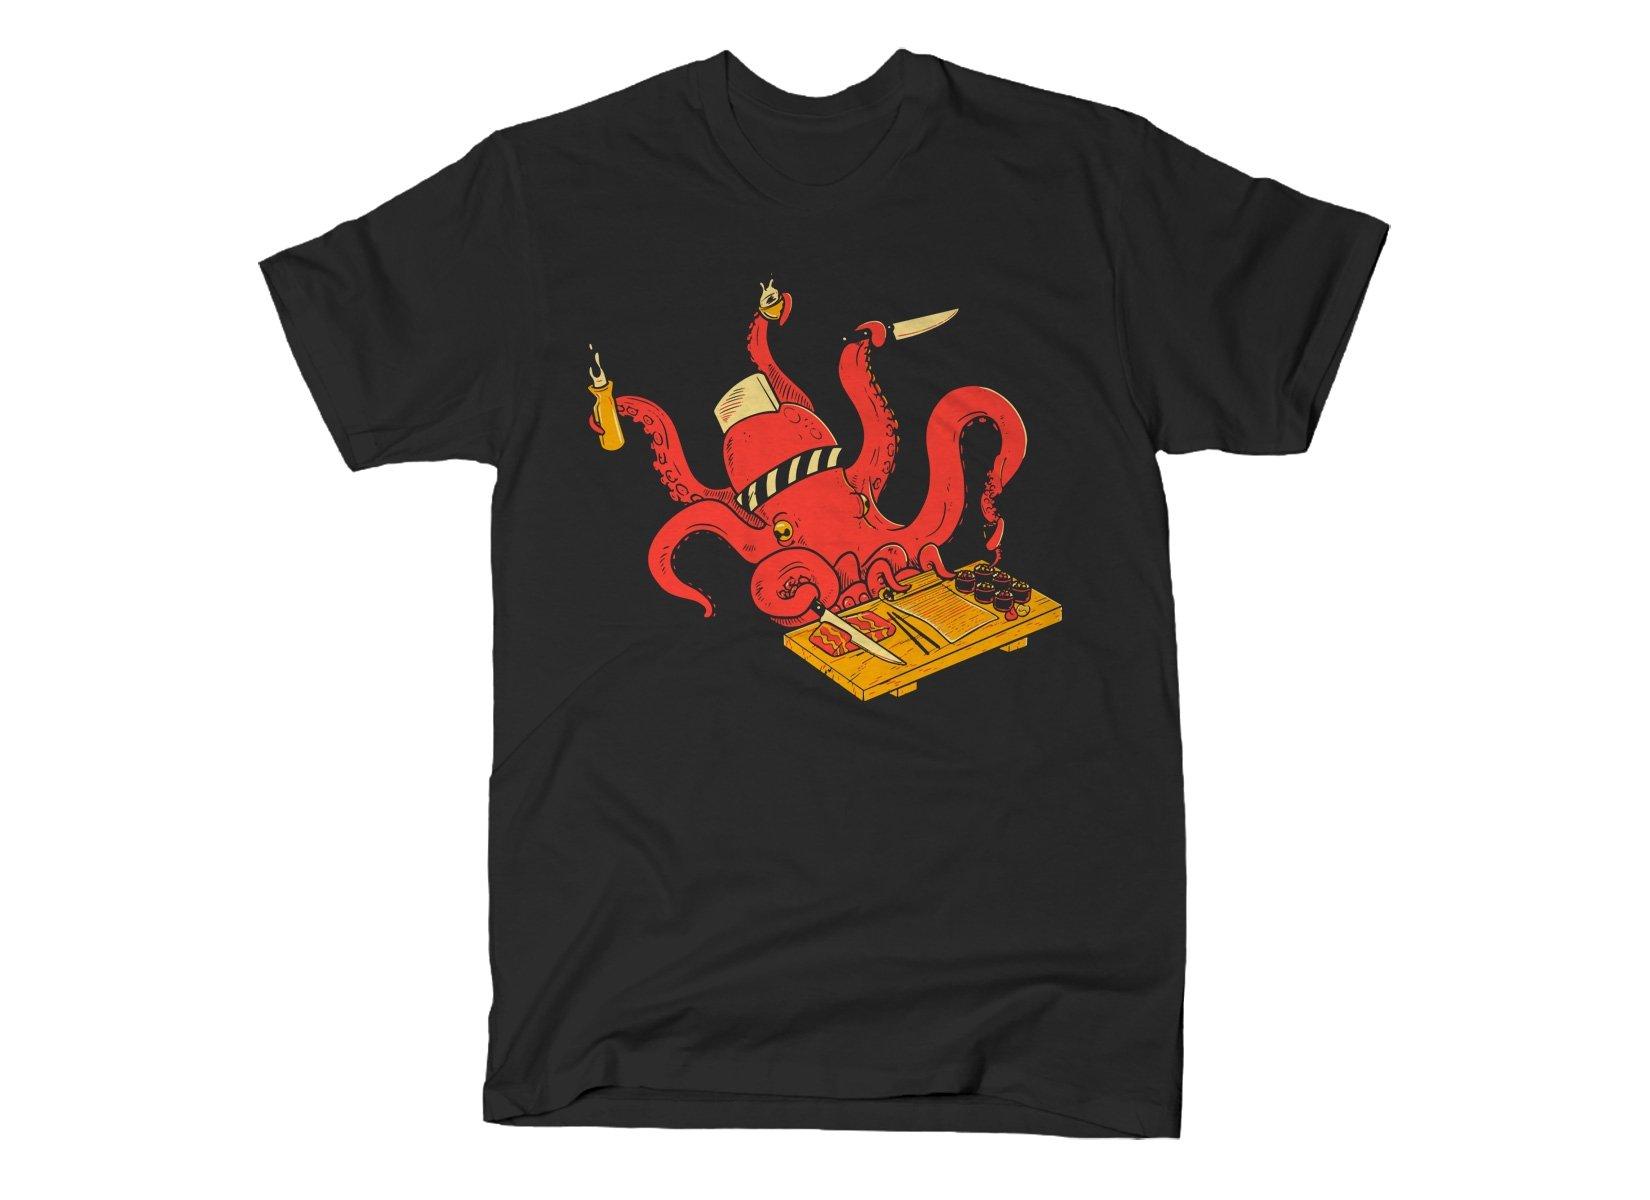 Octo Itamae on Mens T-Shirt